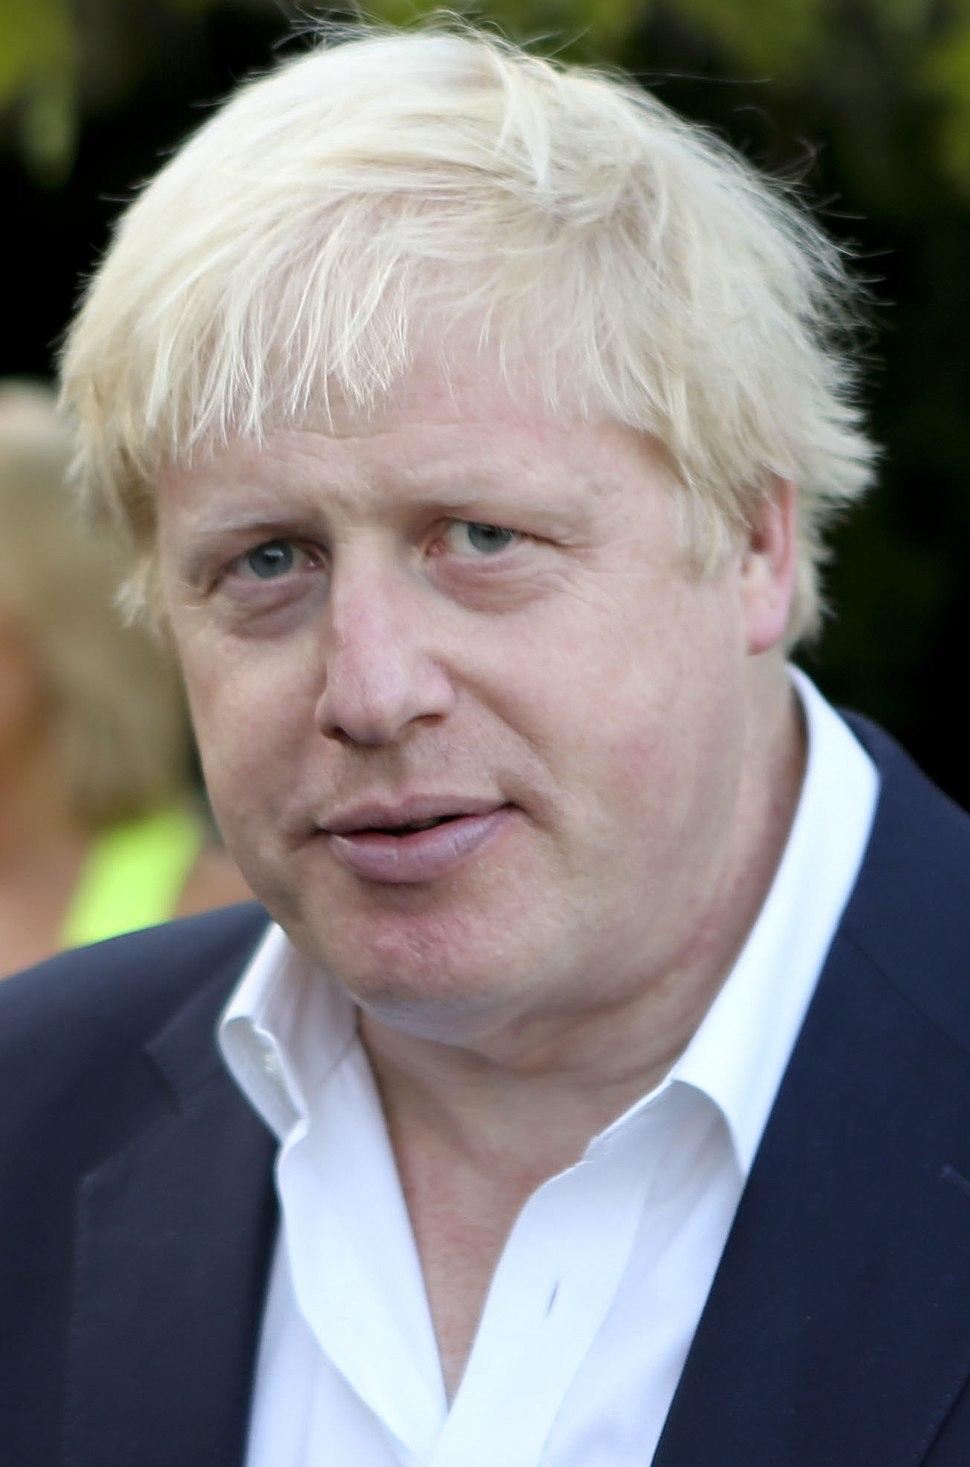 Boris Johnson July 2015